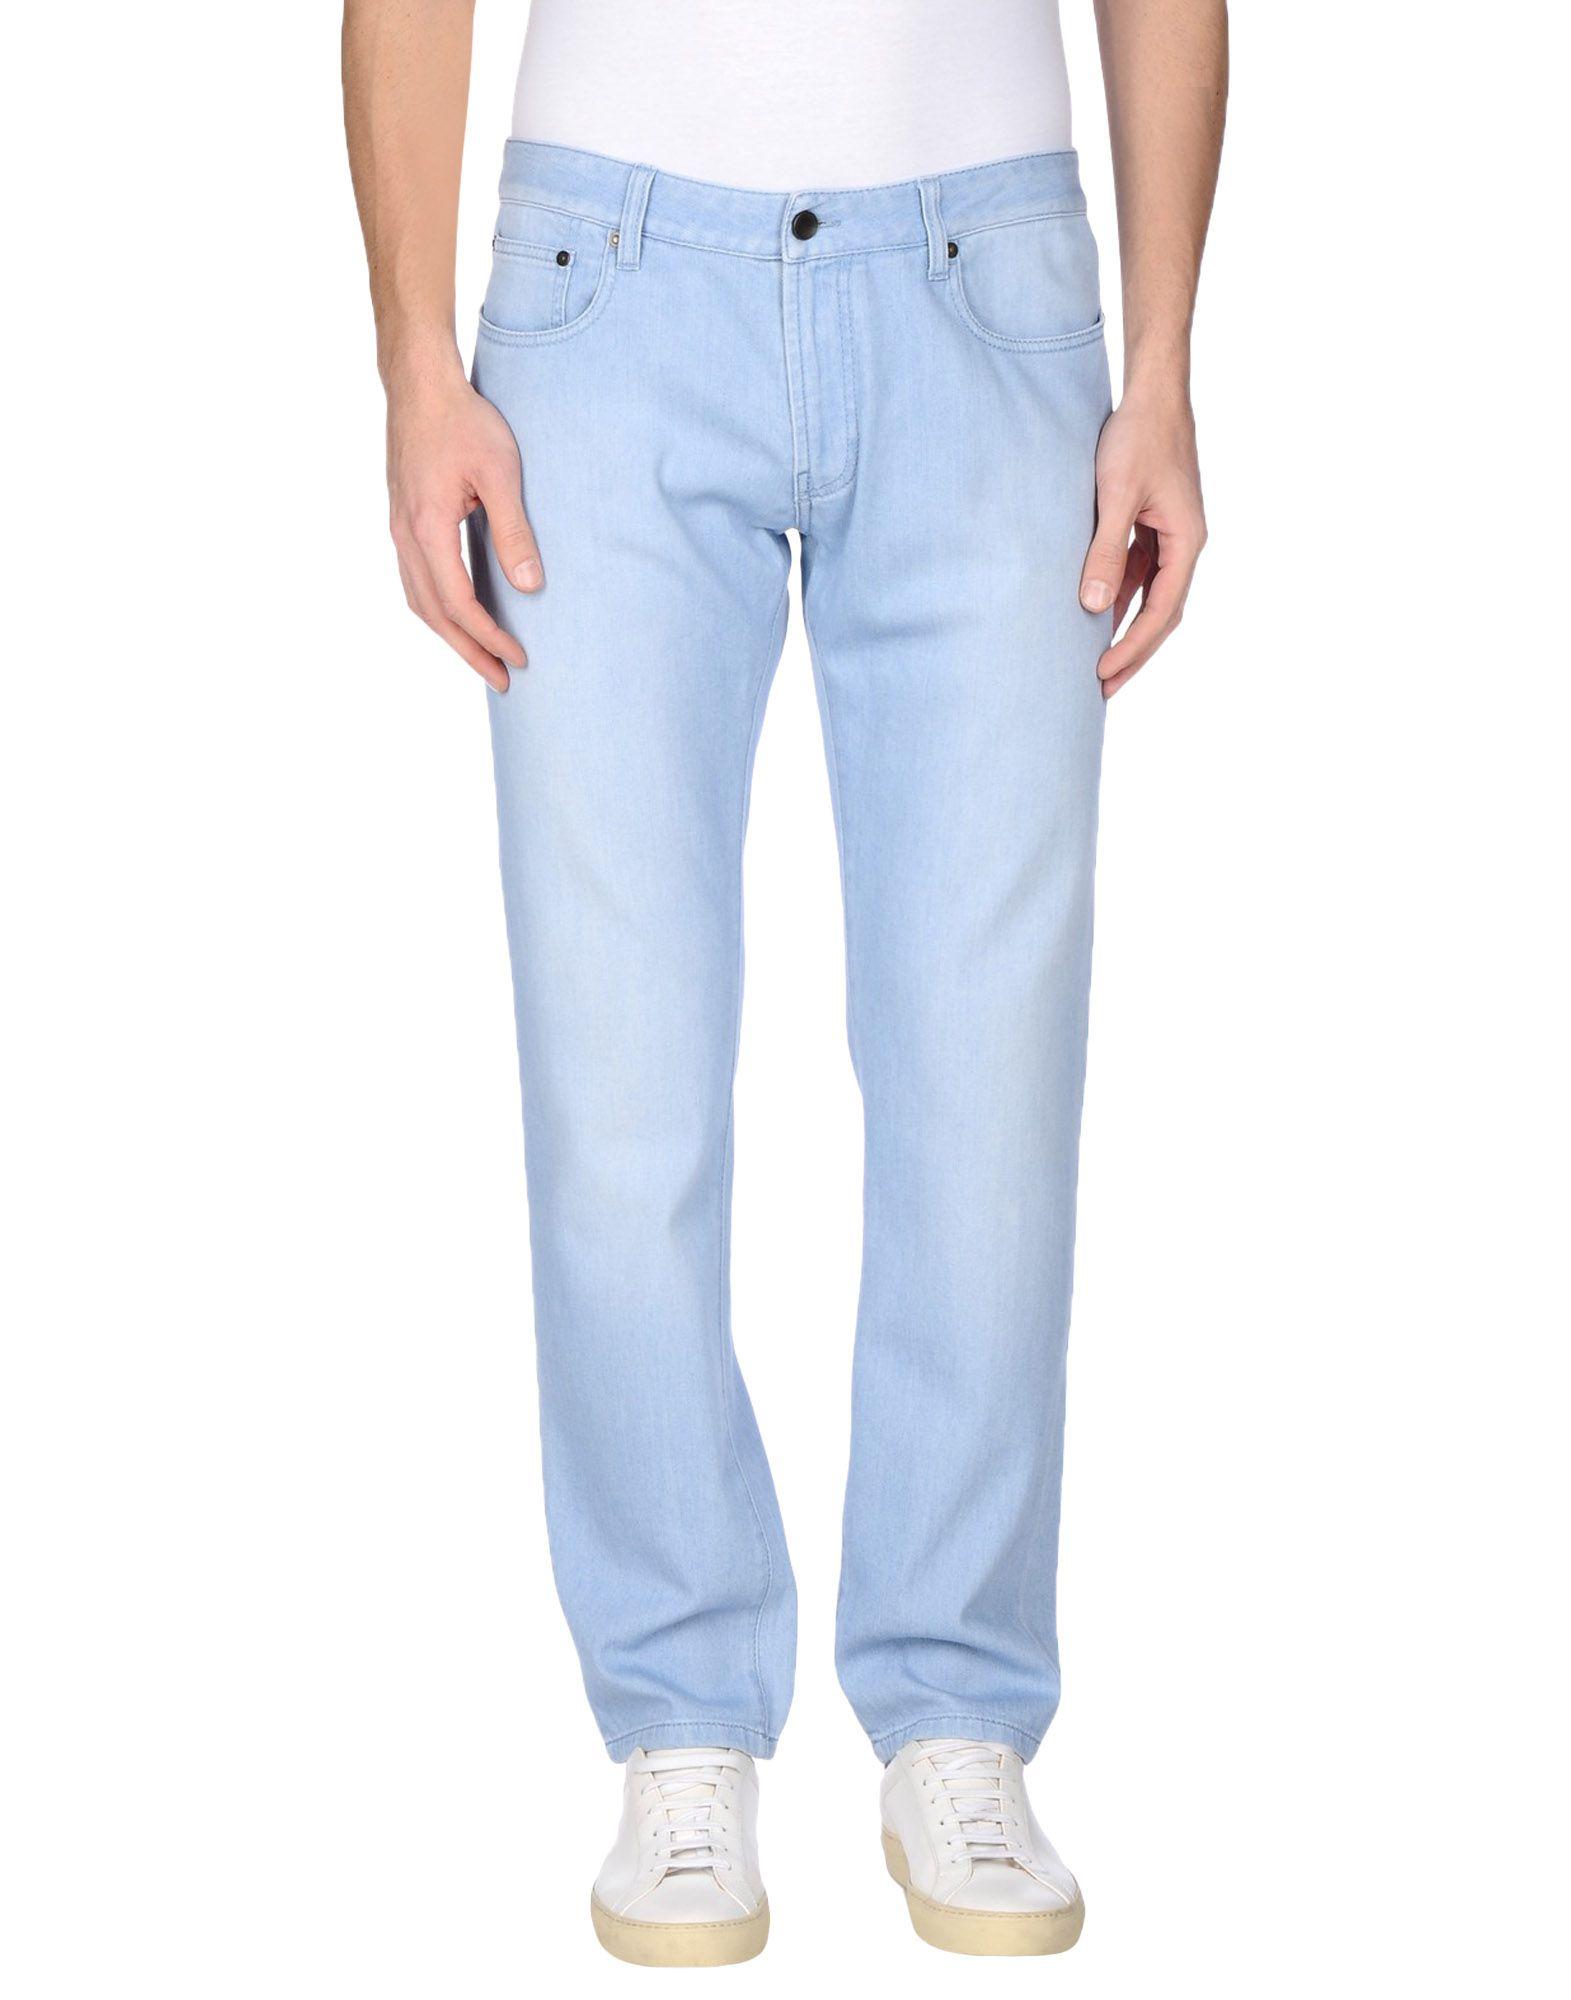 Pantaloni Jeans Giorgio Armani Armani Giorgio Uomo - 42562823QN d01072